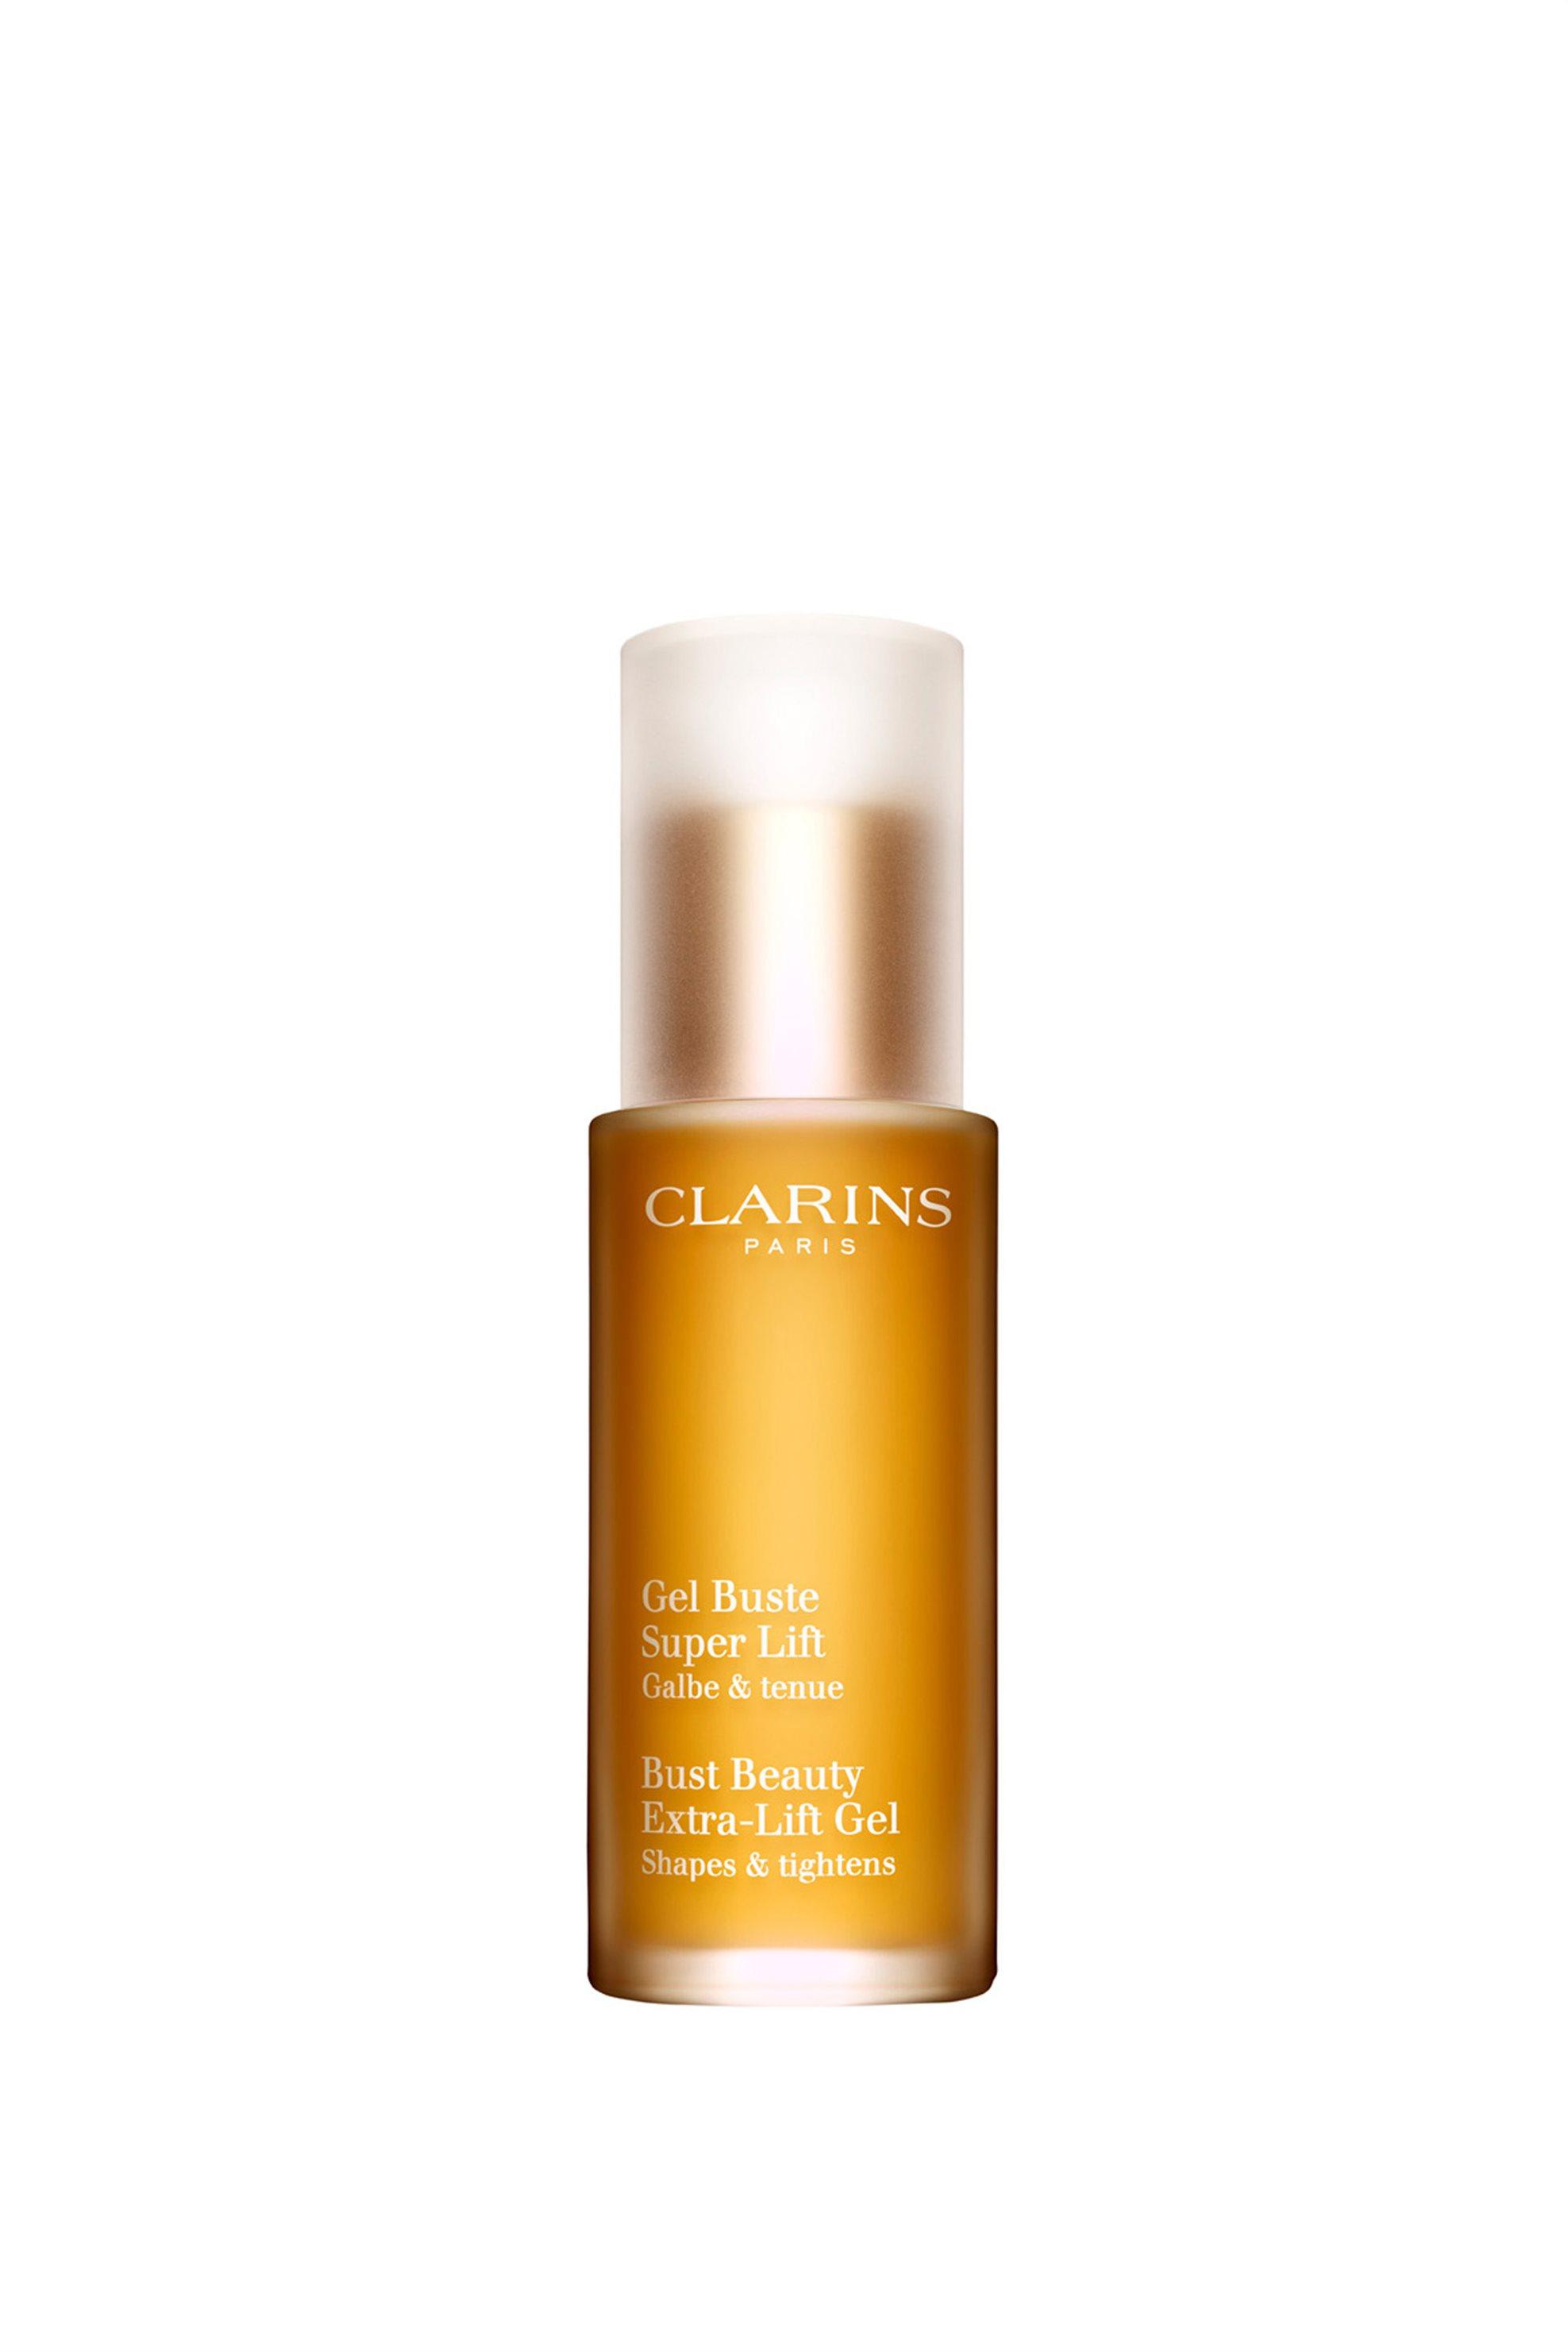 Clarins Bust Beauty Extra Lift Gel 50 ml - 172010 ομορφια   καλλυντικα επιλεκτικησ   περιποίηση προσώπου   εξειδικευμένη φροντίδα